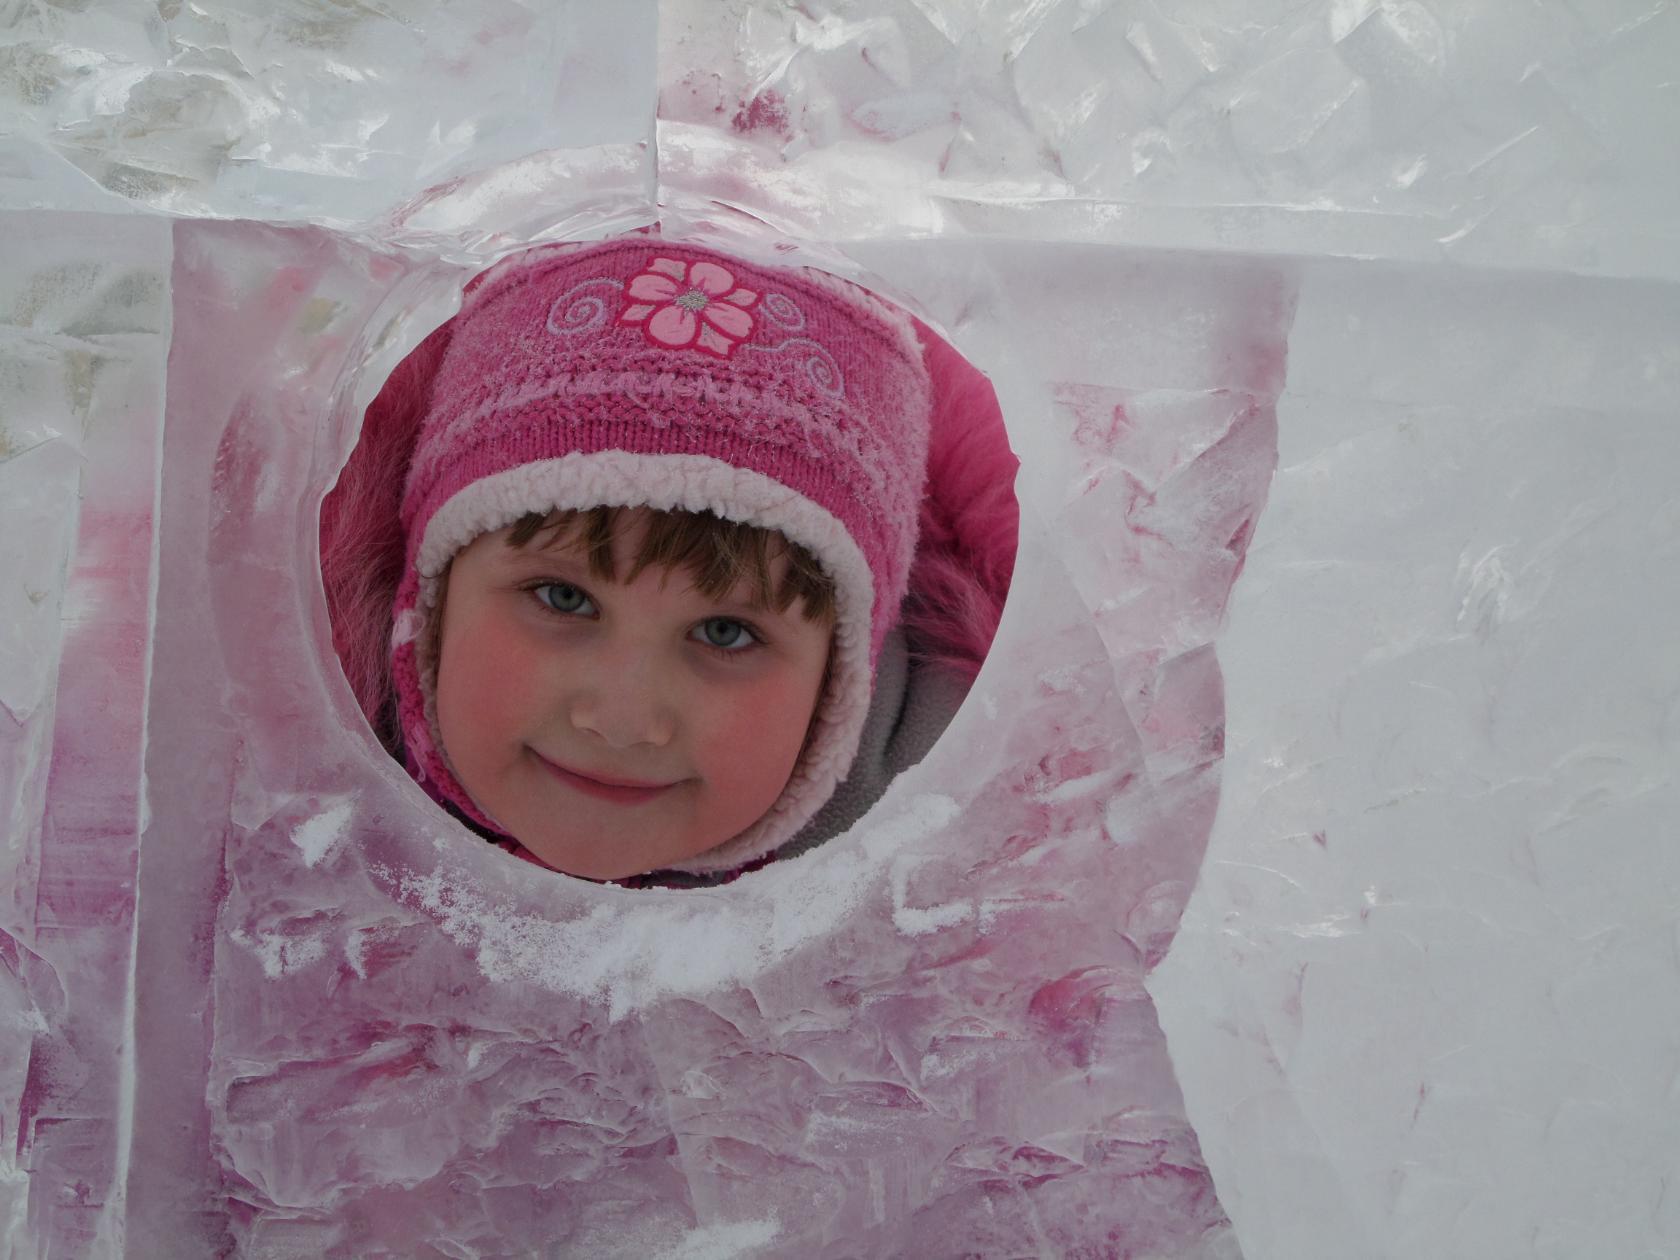 В ледяном царстве. Зимний образ